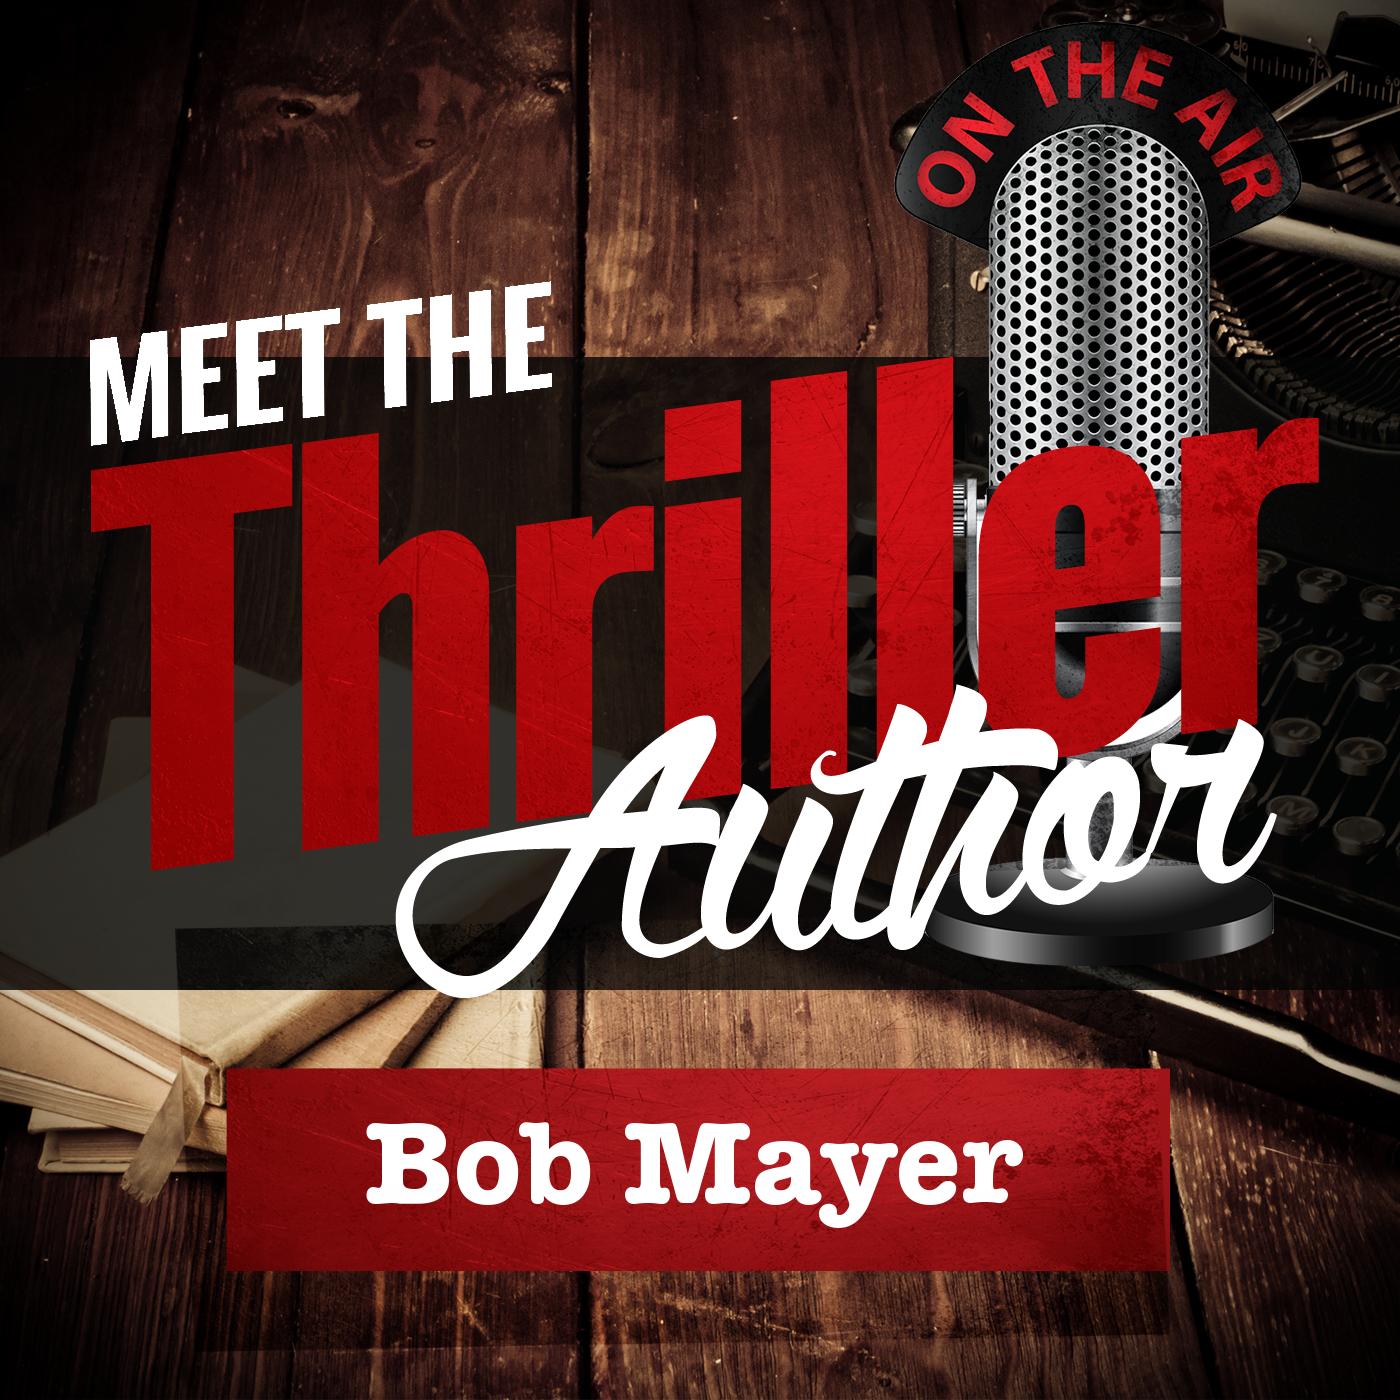 Meet the Thriller Author: Bob Mayer